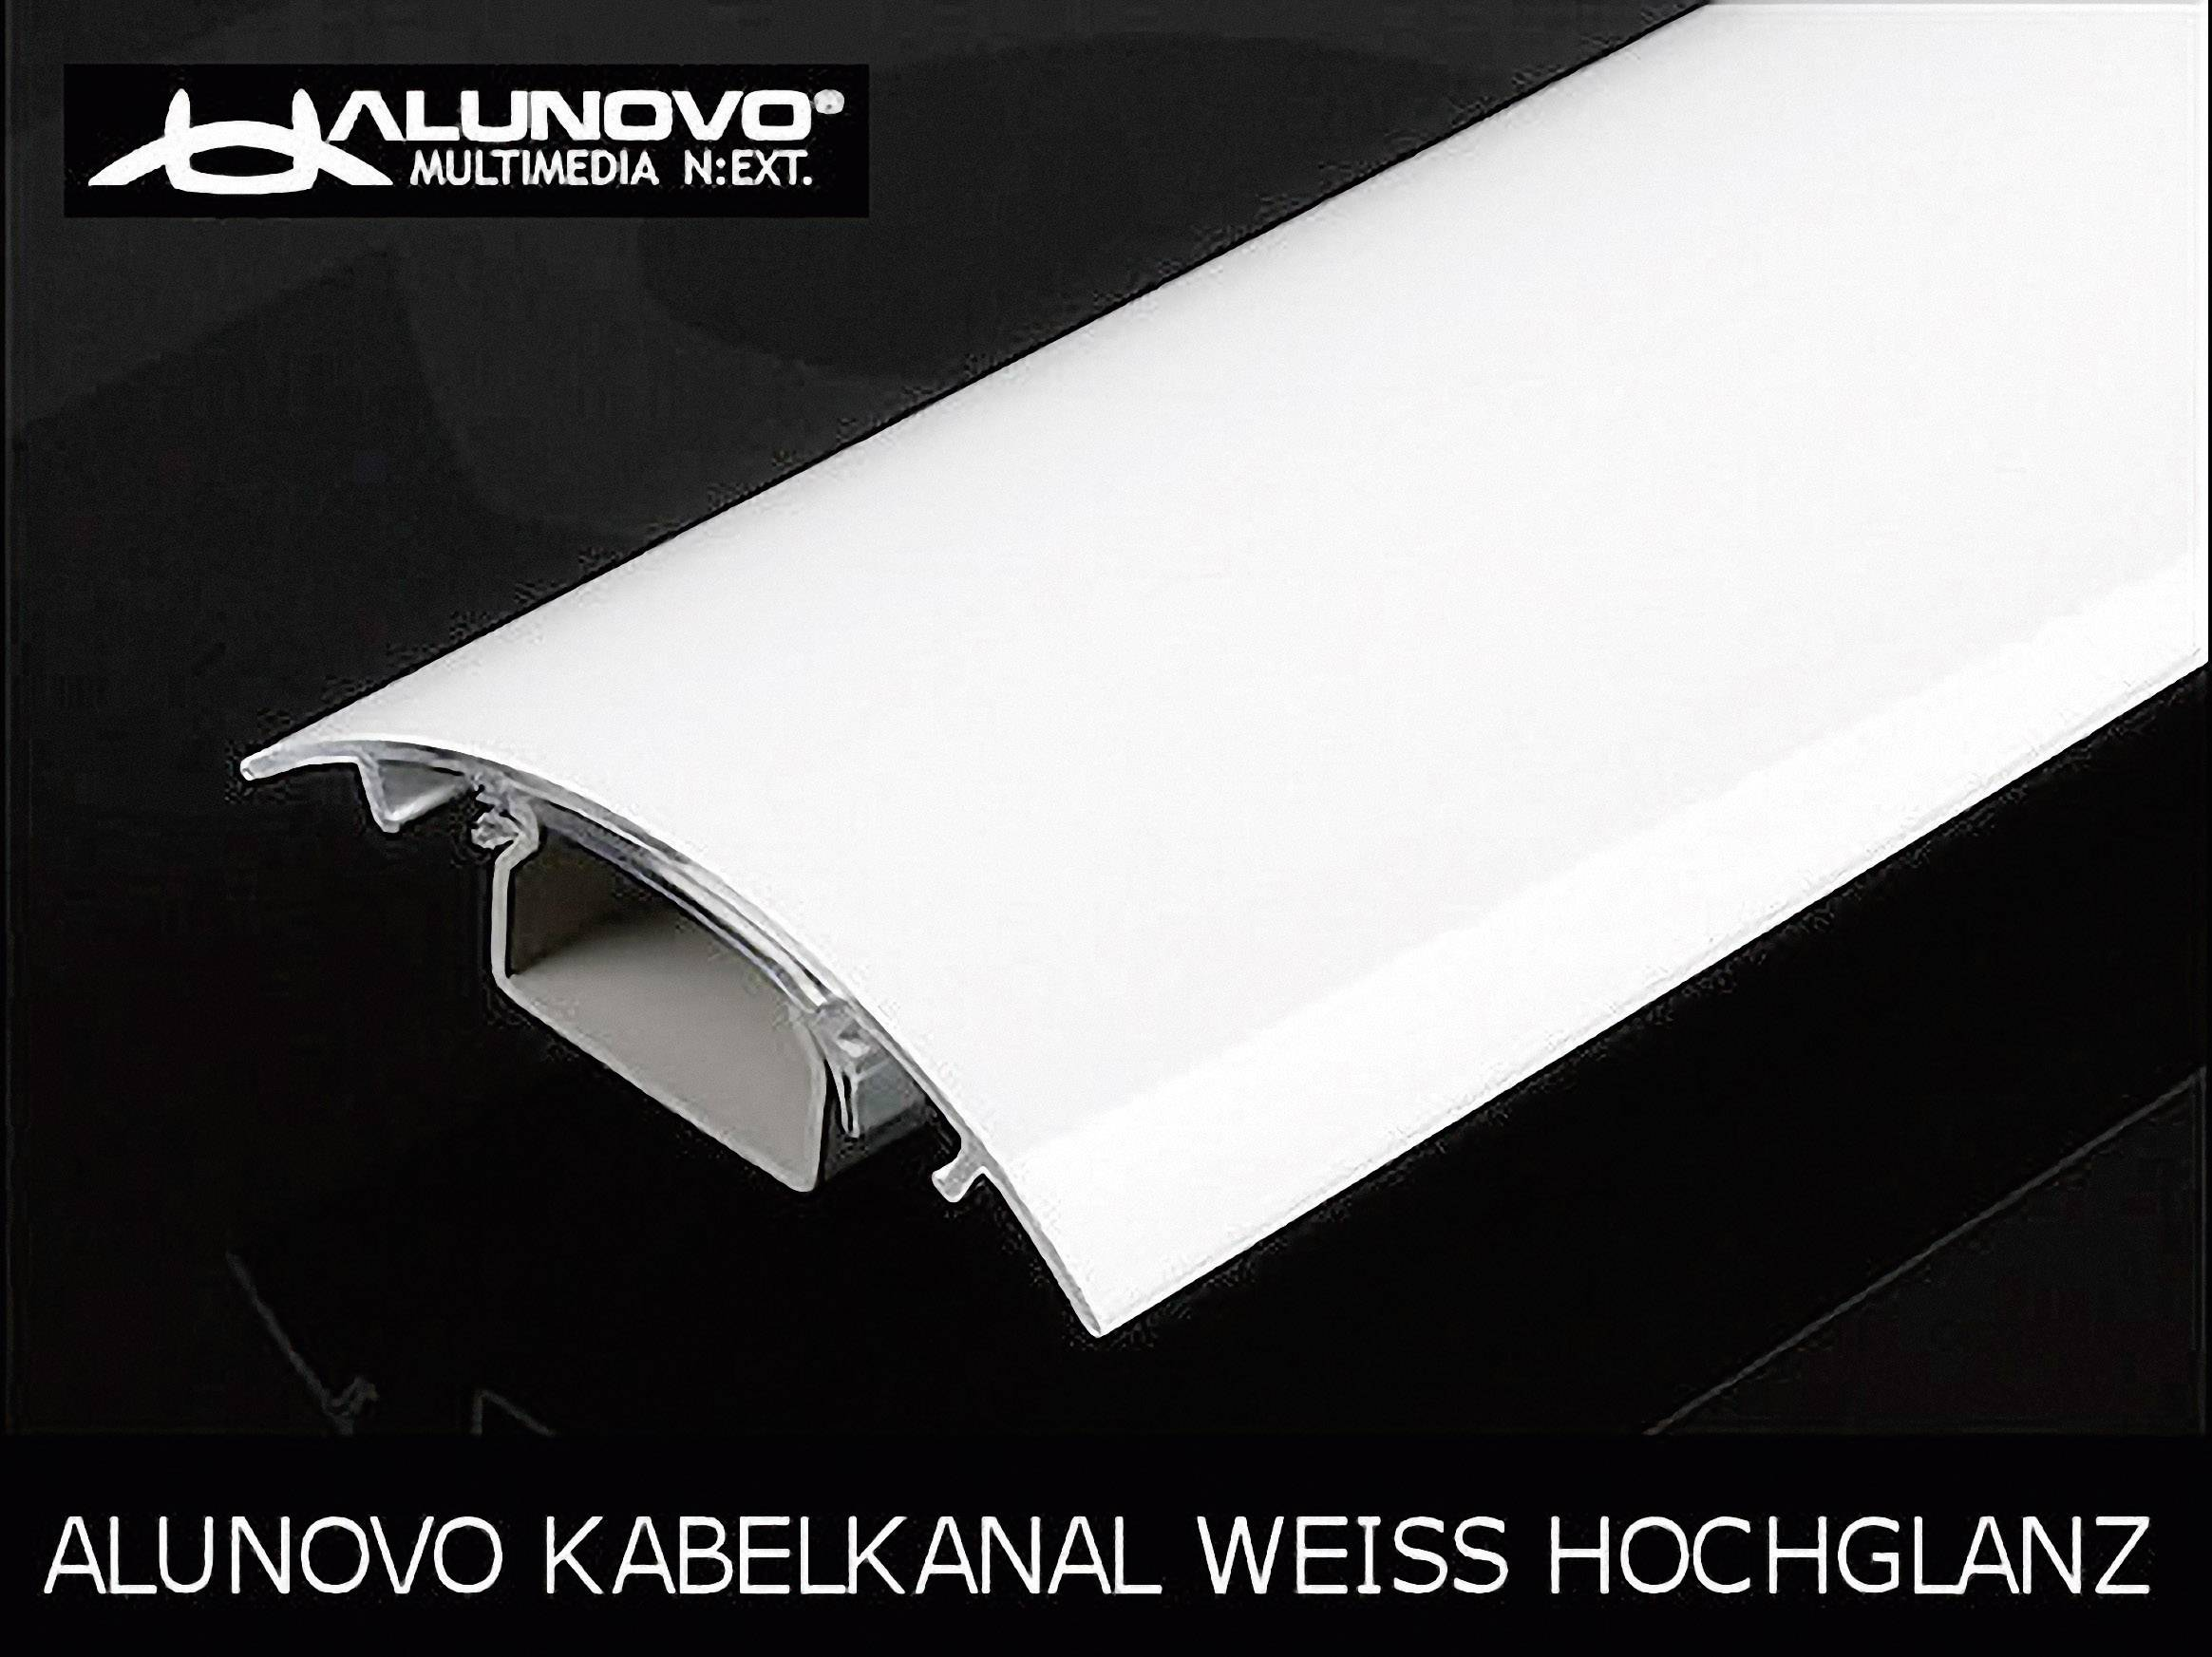 Káblová lišta Alunovo HW90-025, 1 ks, biela (lesklá)